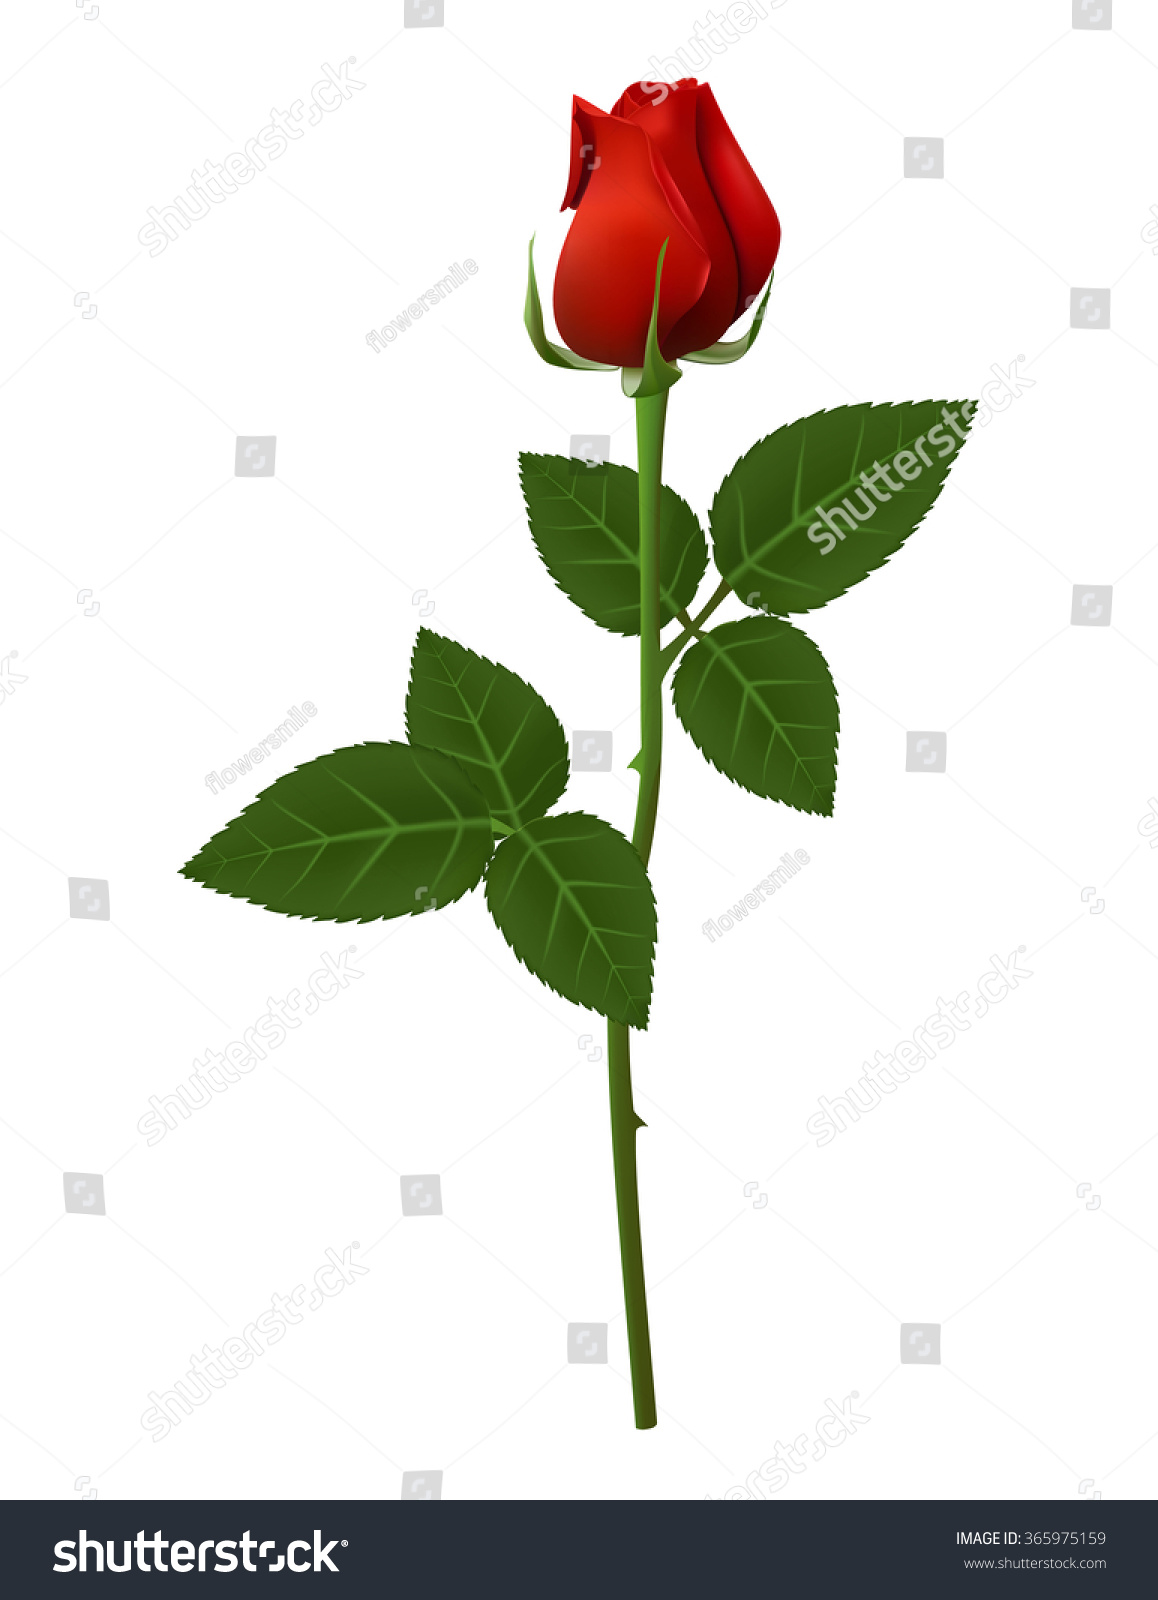 Single Red Rose Flower Vector Illustration Stock Vector 365975159 ... for Transparent Png Images Roses  181plt